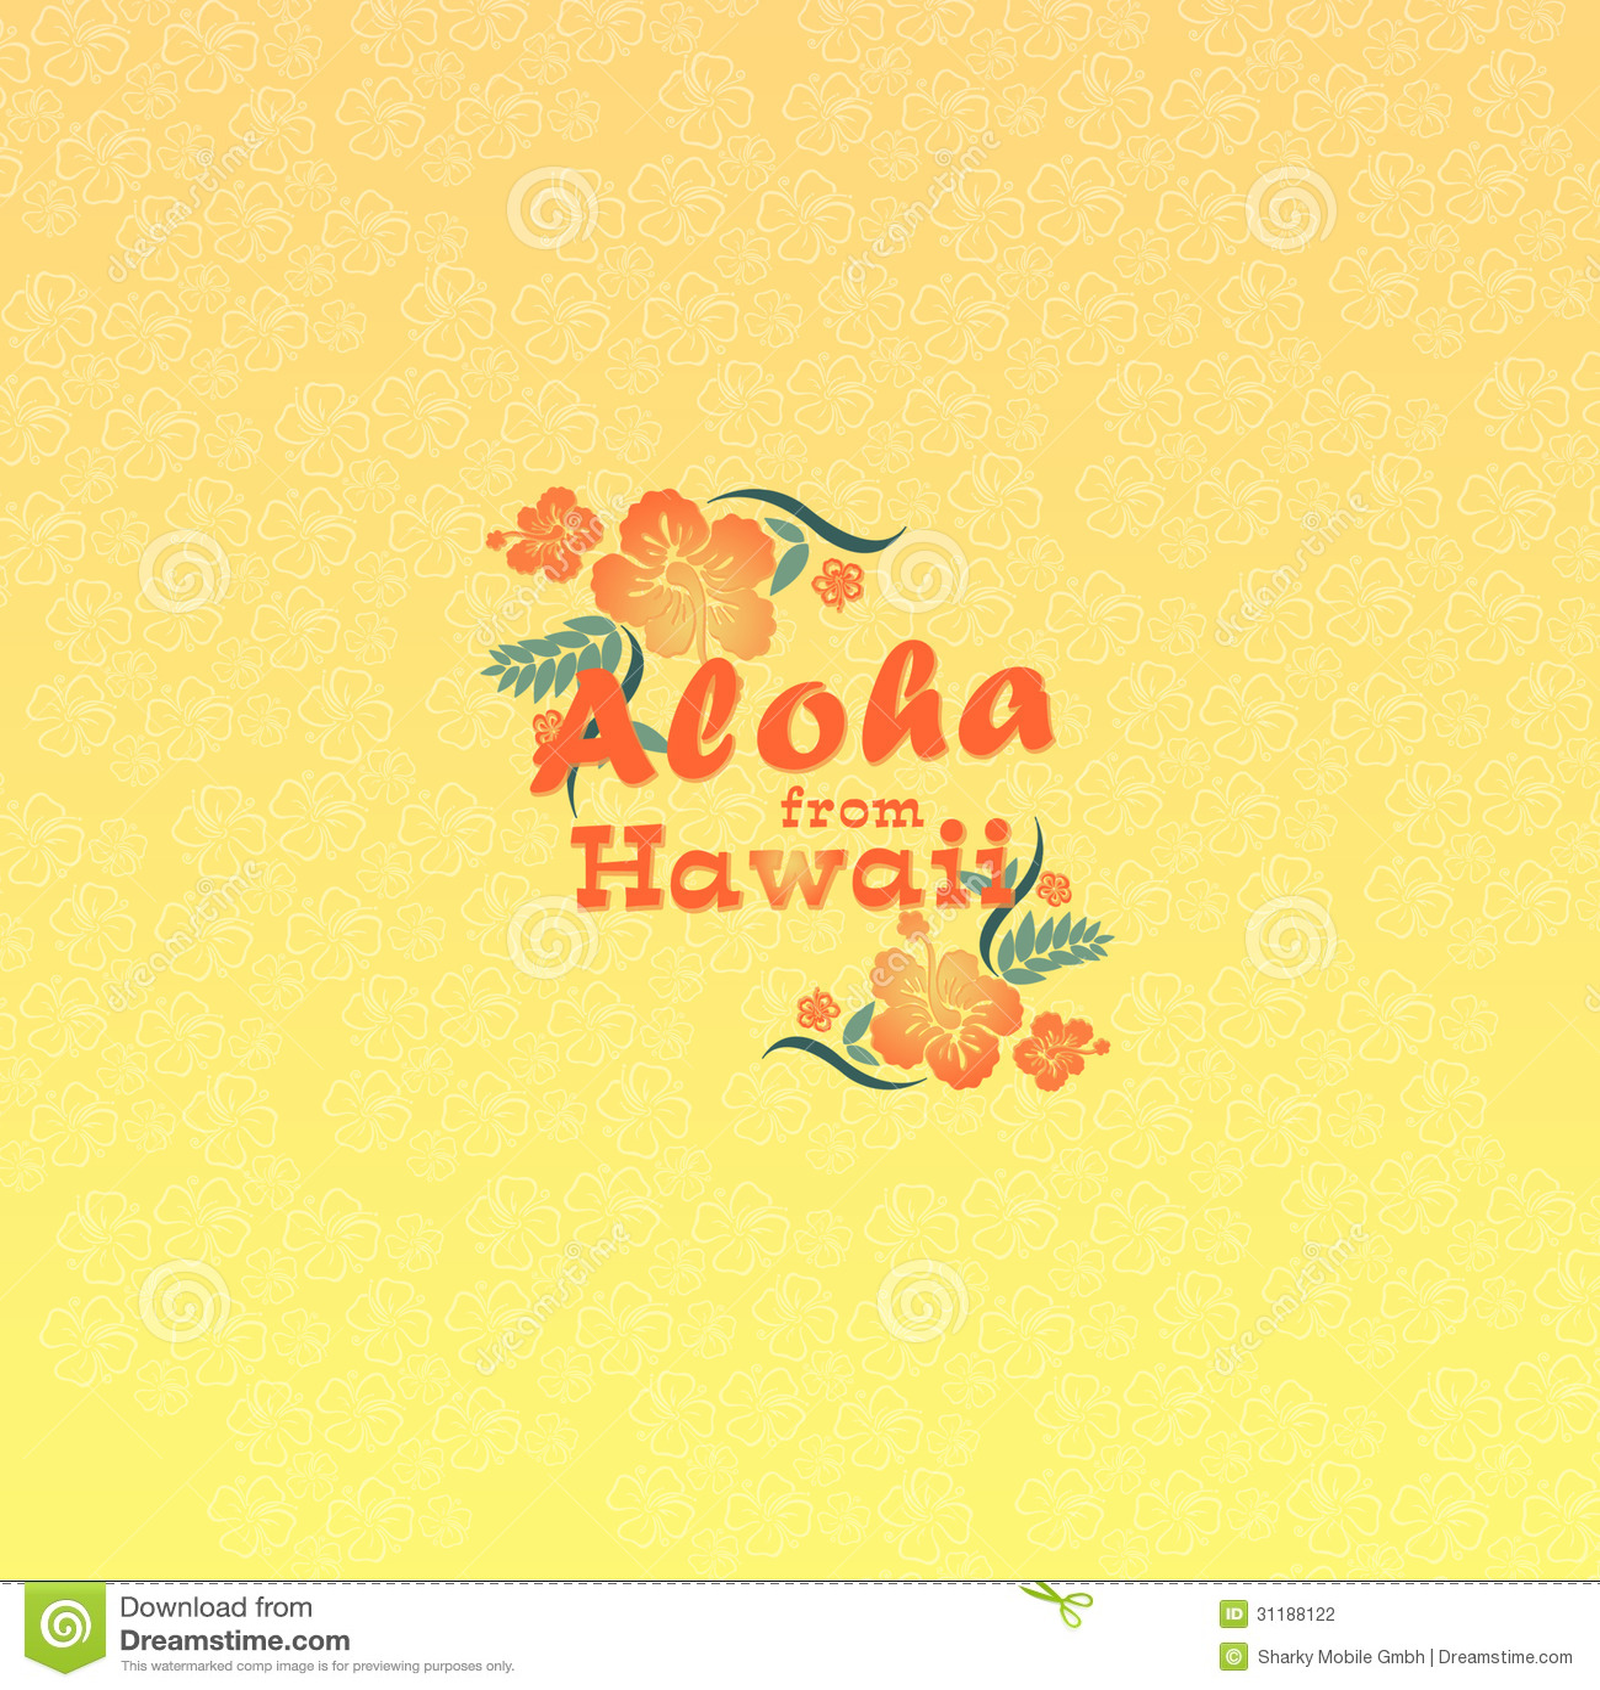 Aloha from hawaii  вконтакте